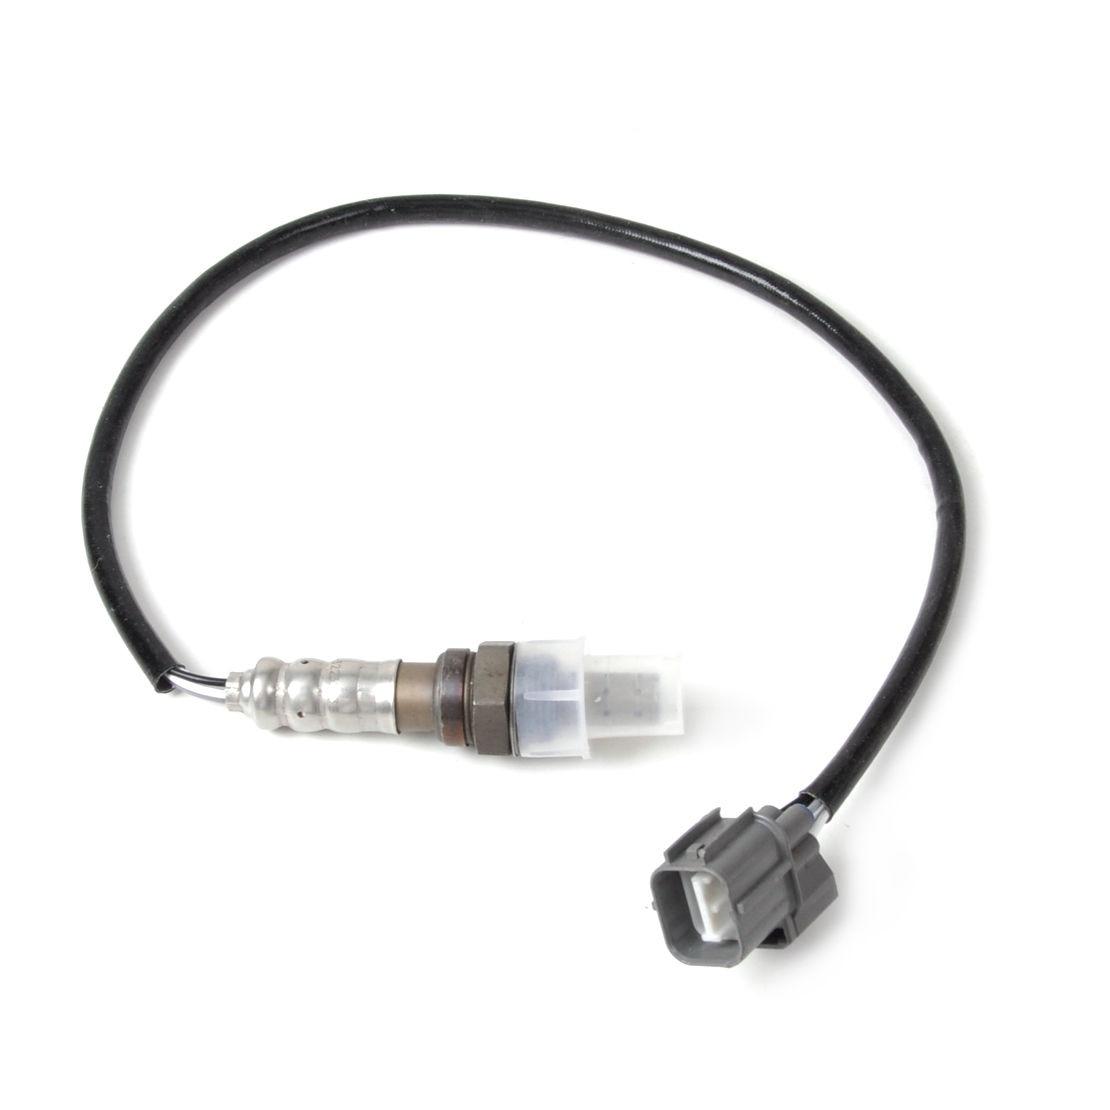 Am-32232736 vorne ntk ngk lambda sauerstoff o2 sensor für honda acura civic cr-v csl2017